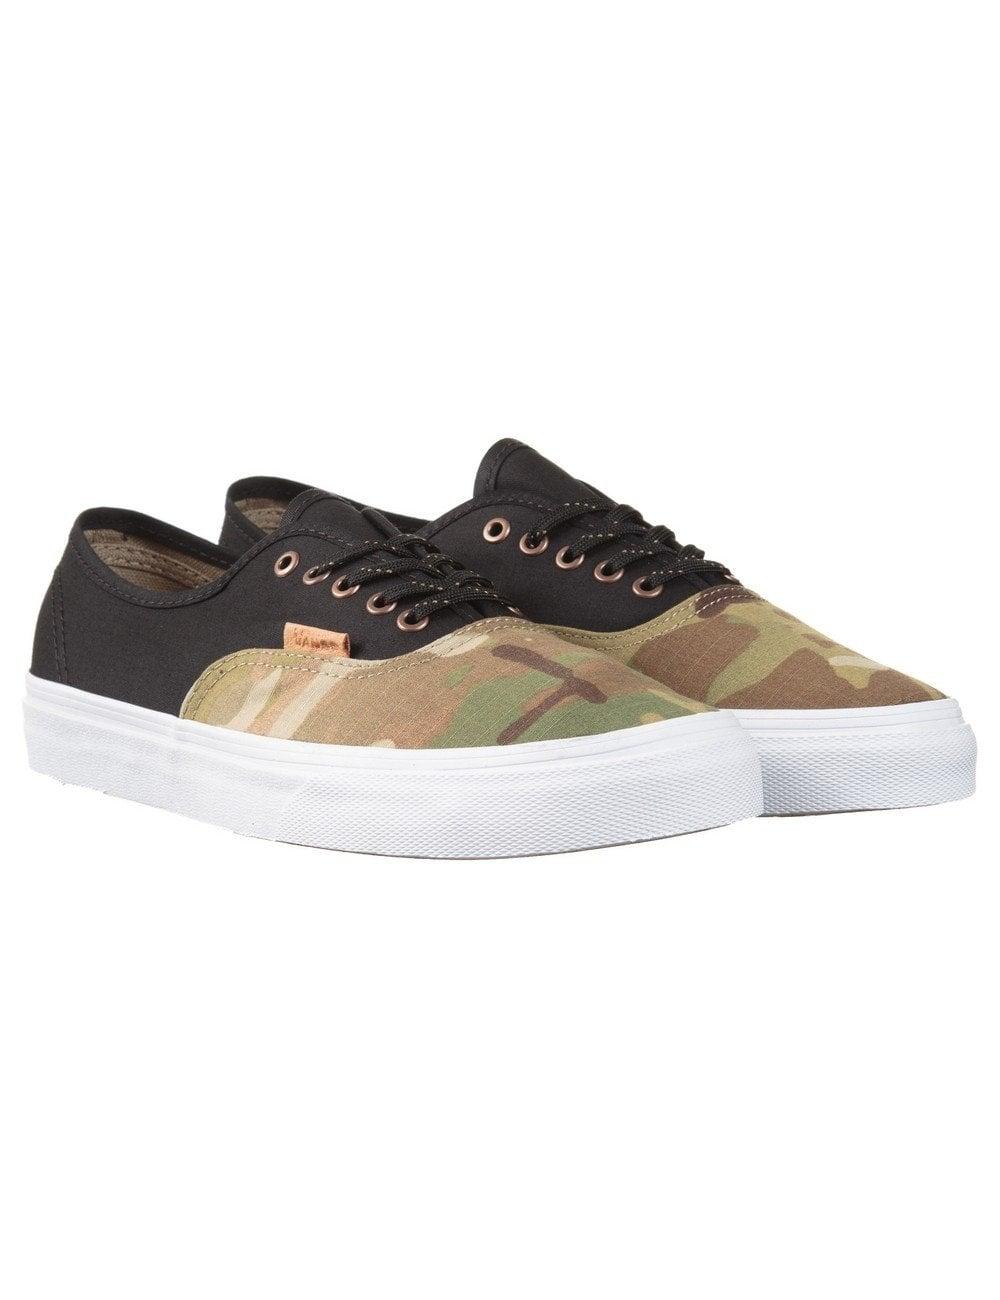 Vans California Authentic Trainers - Black (Multicamo) - Footwear ... 43a07cfad